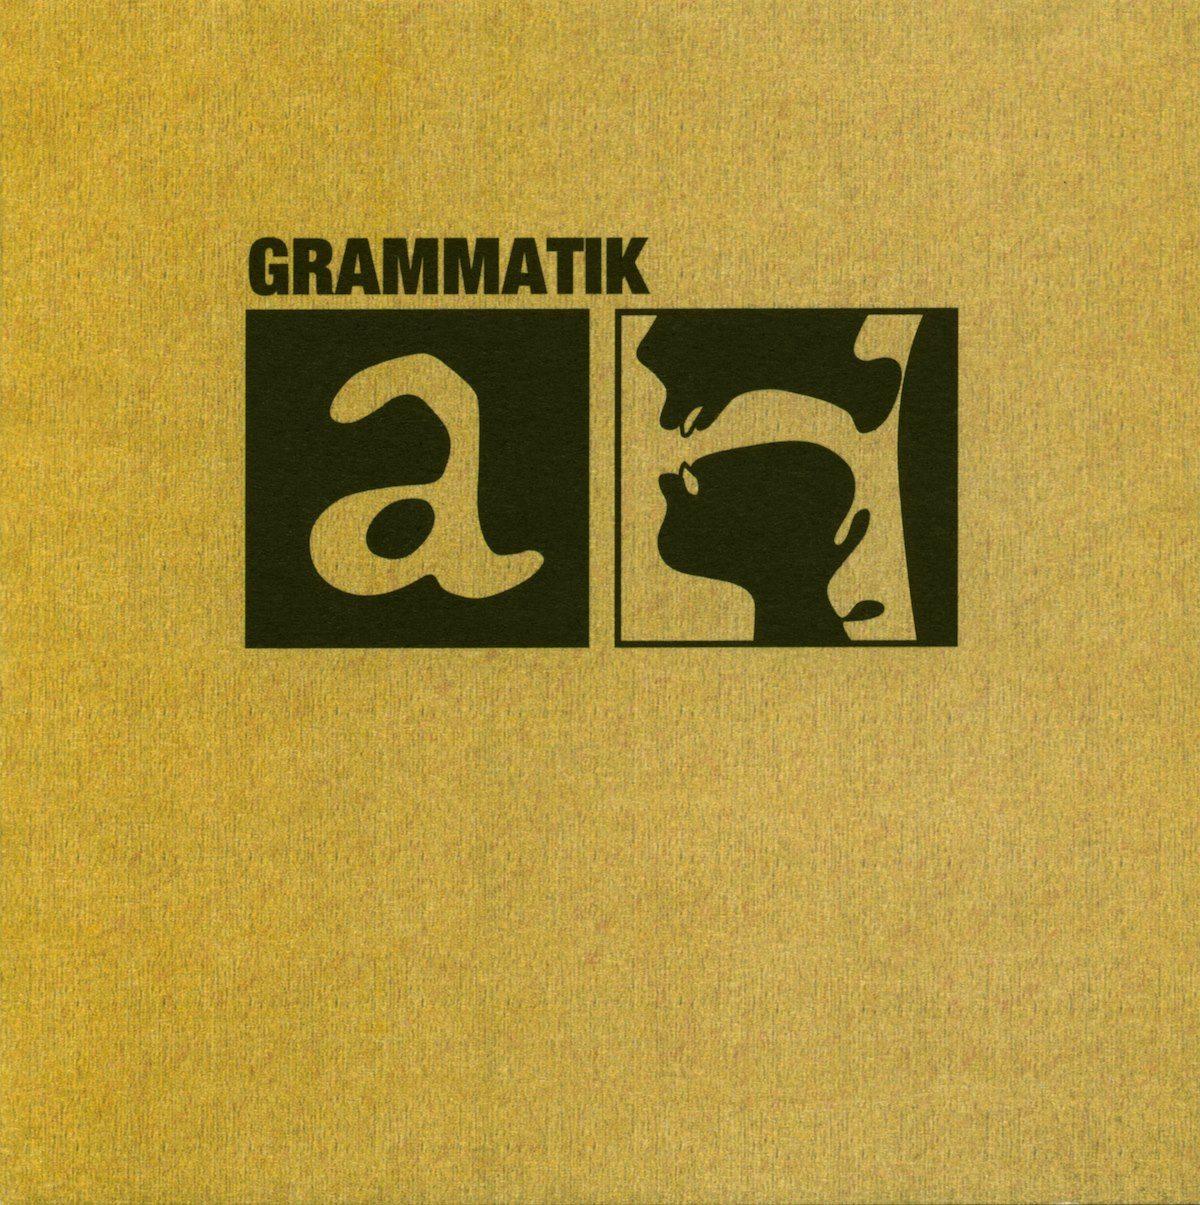 grammatik ep